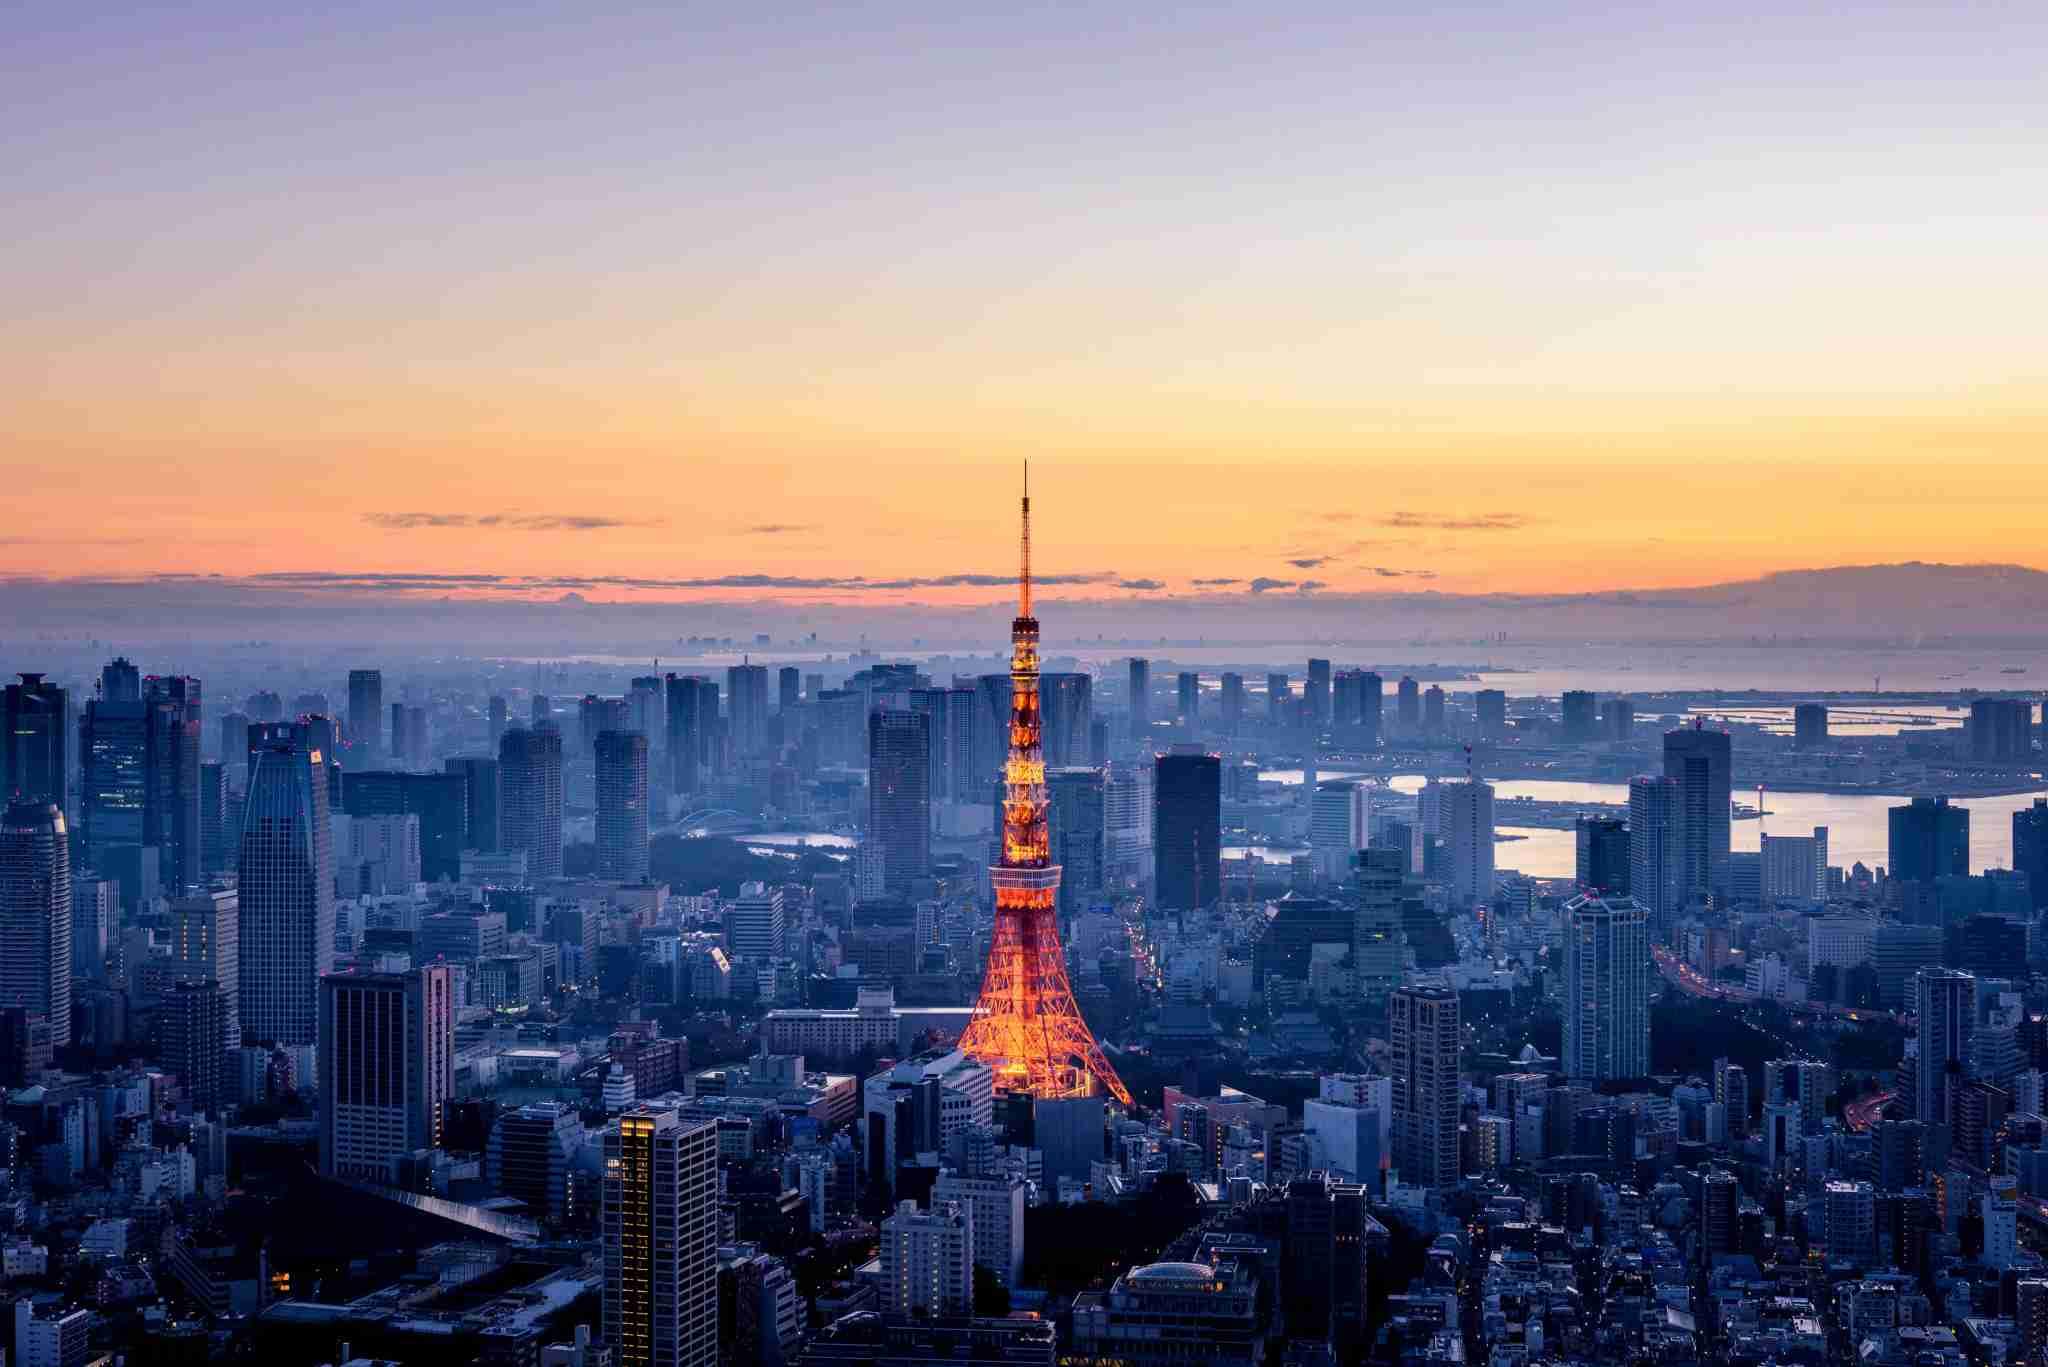 Anyone would love exploring Tokyo. (Photo by Yukinori Hasumi/Getty Images)